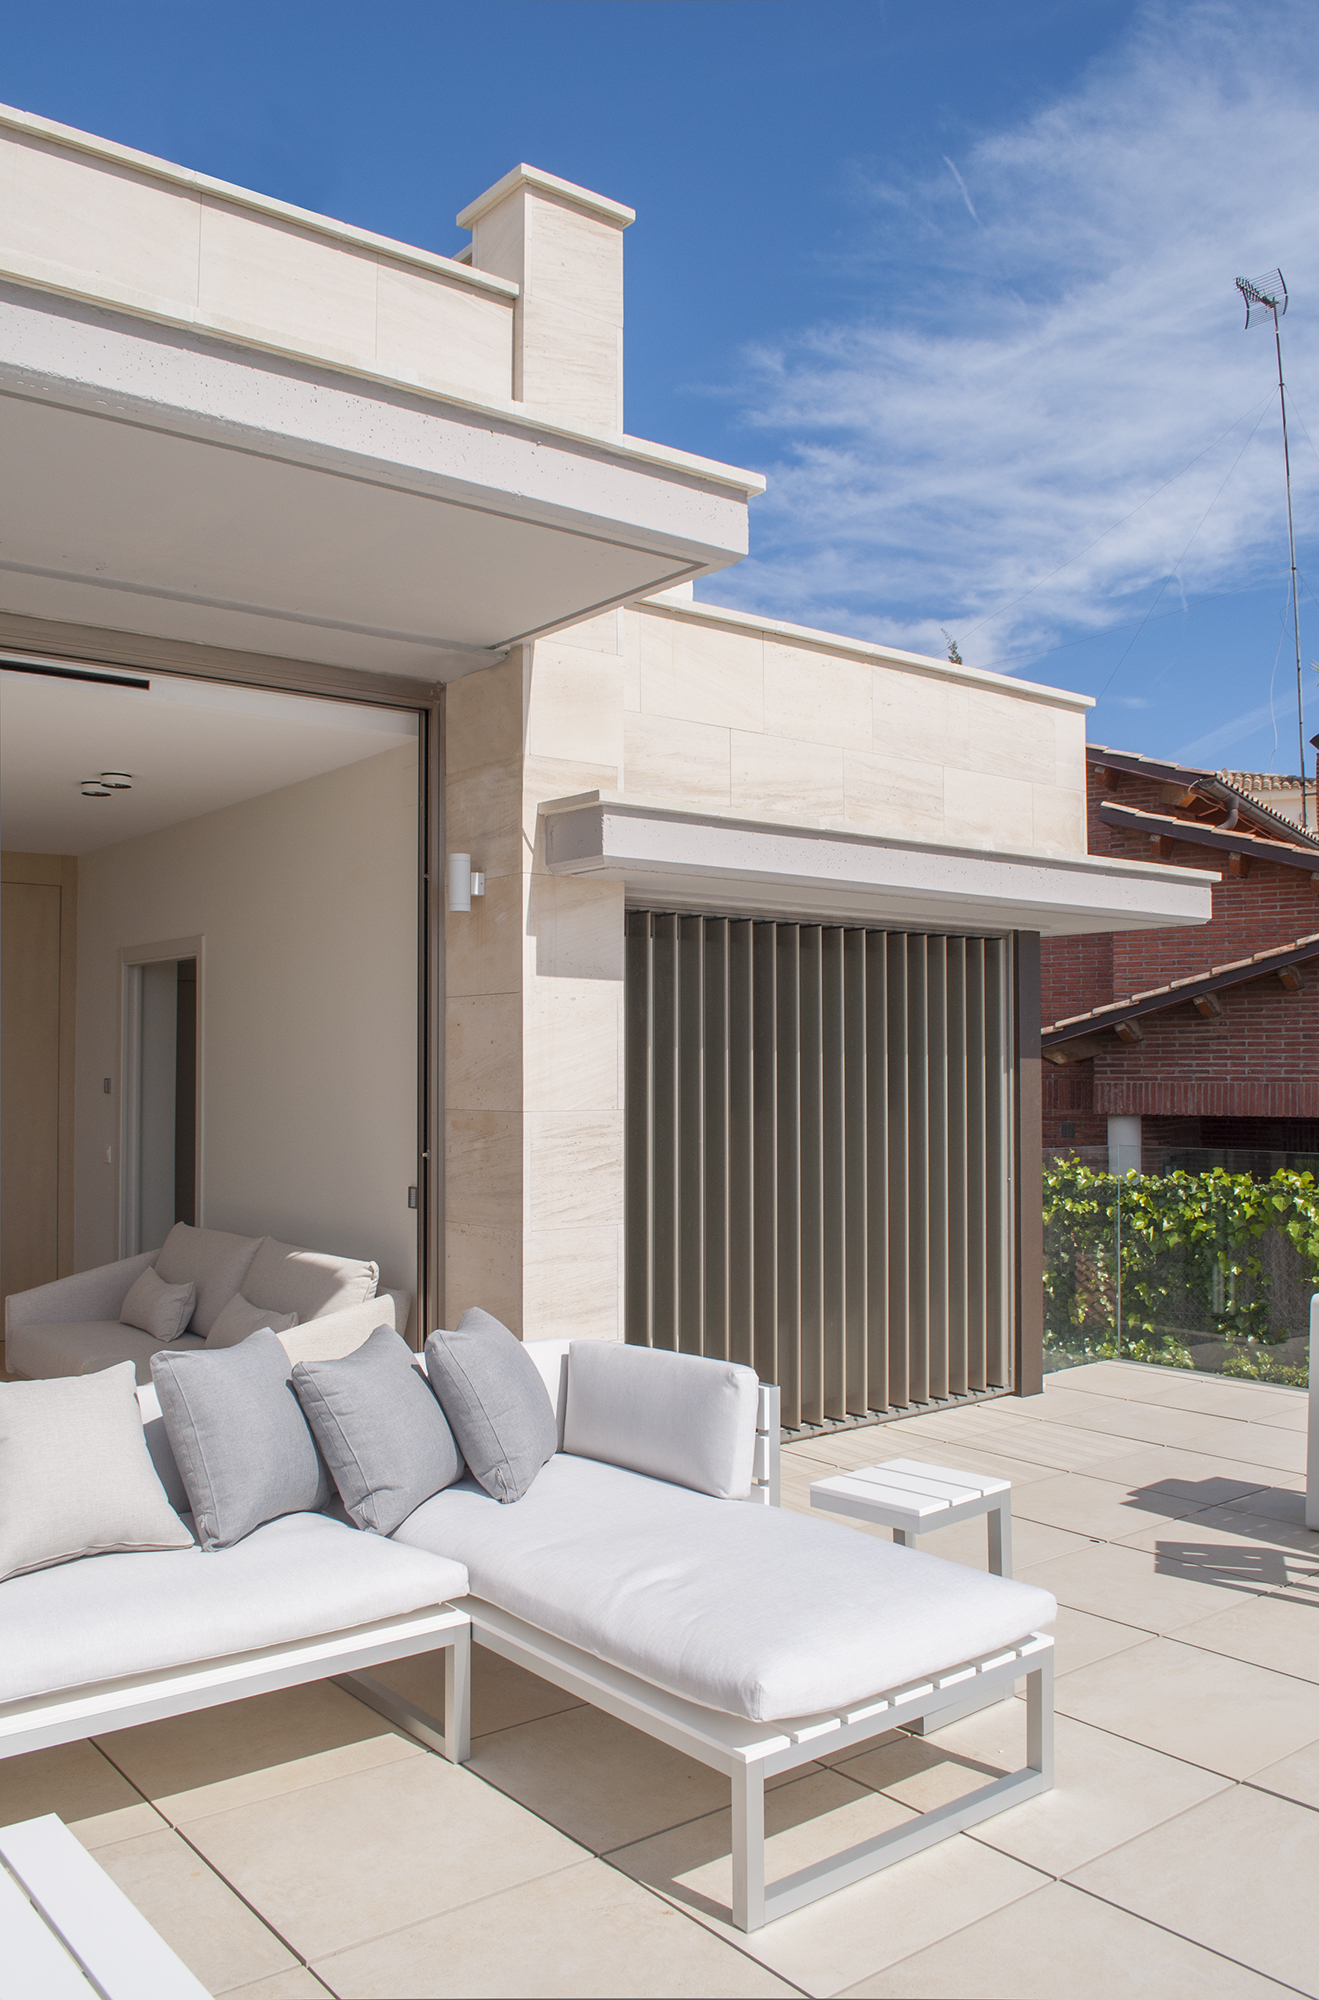 13-rardo-architects-casas-en-sitges-lamas-volumen-terraza